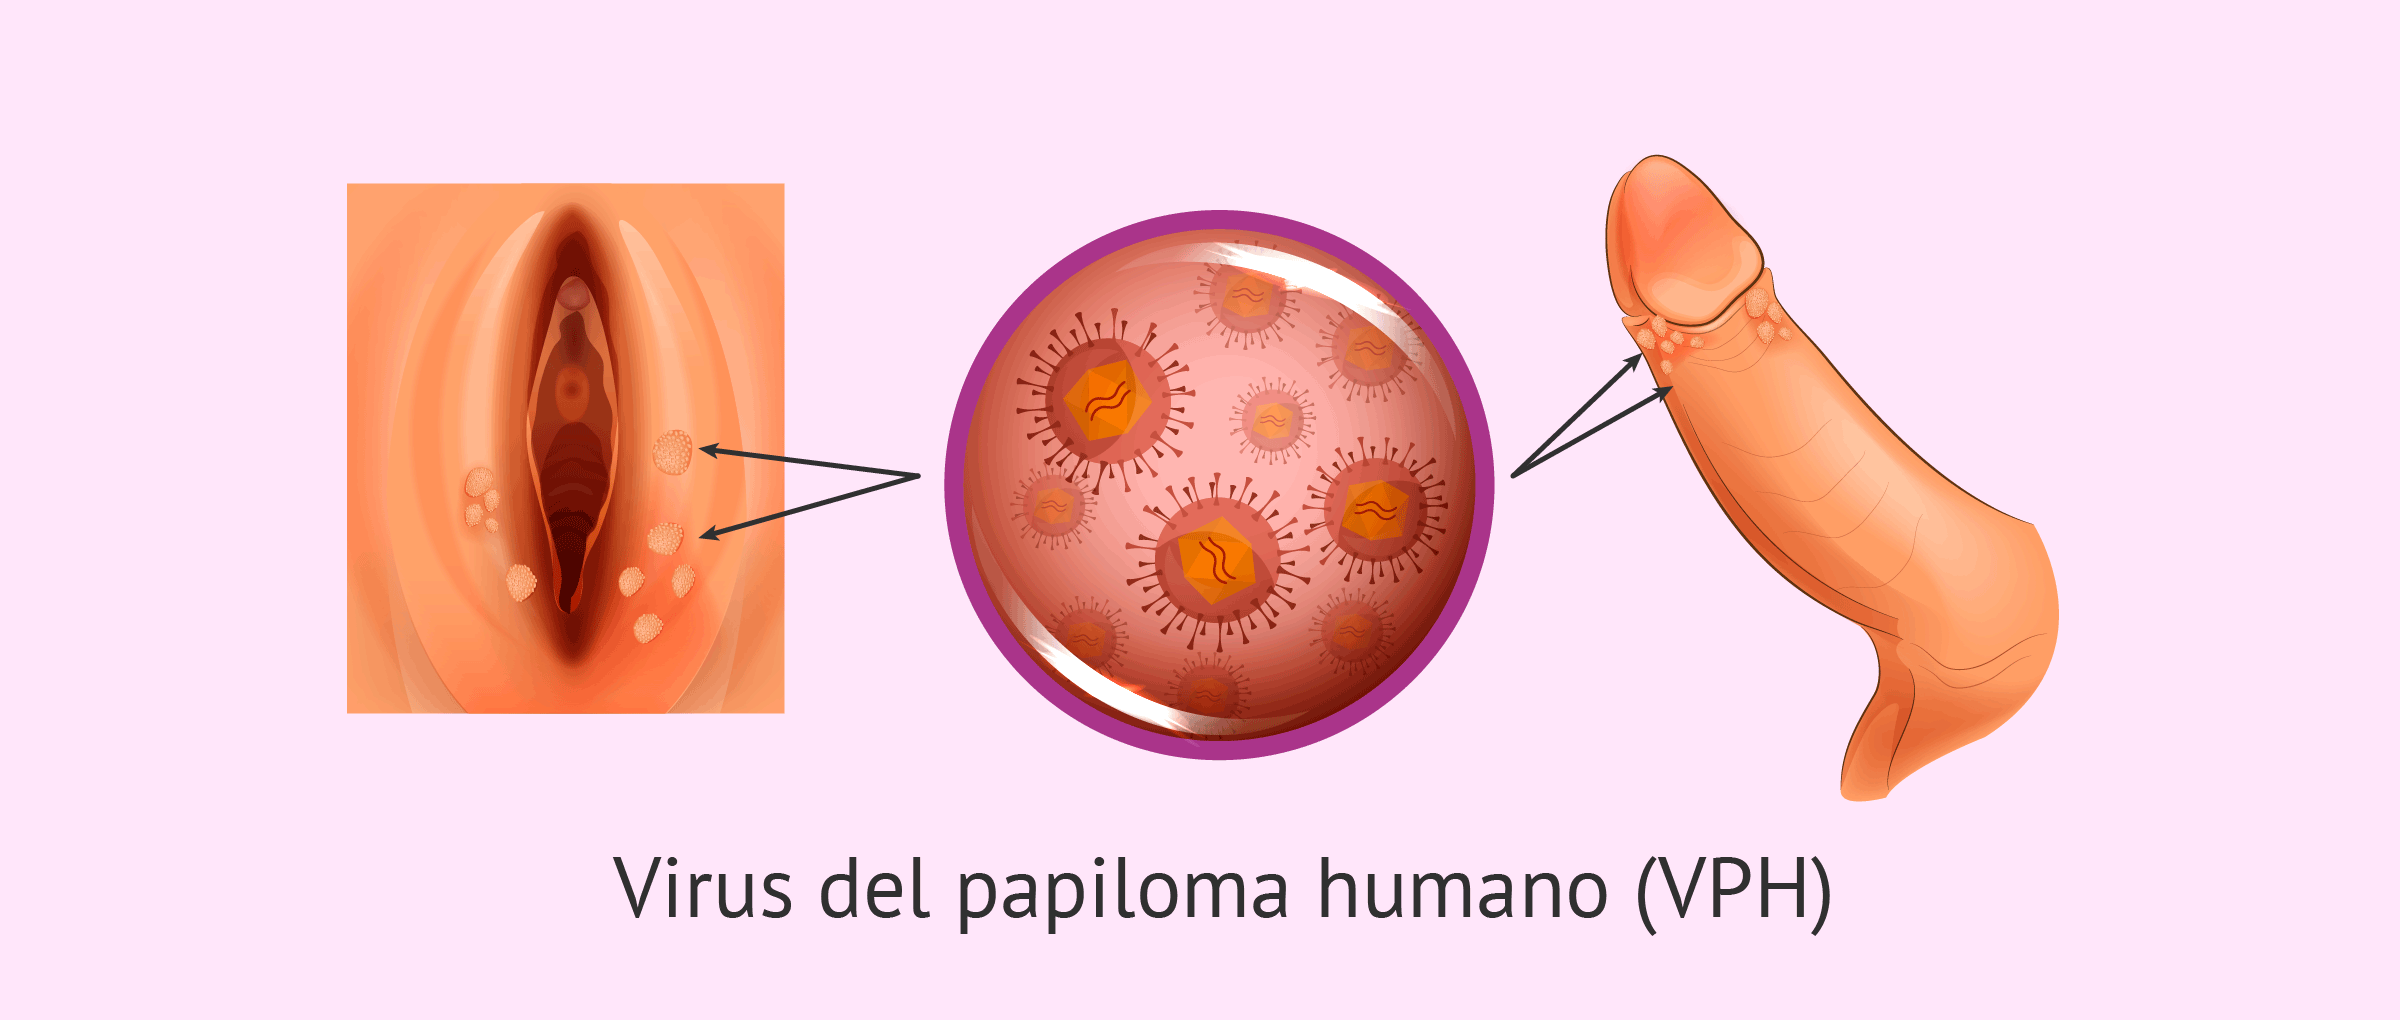 virusul papilomavirus uman transmis)